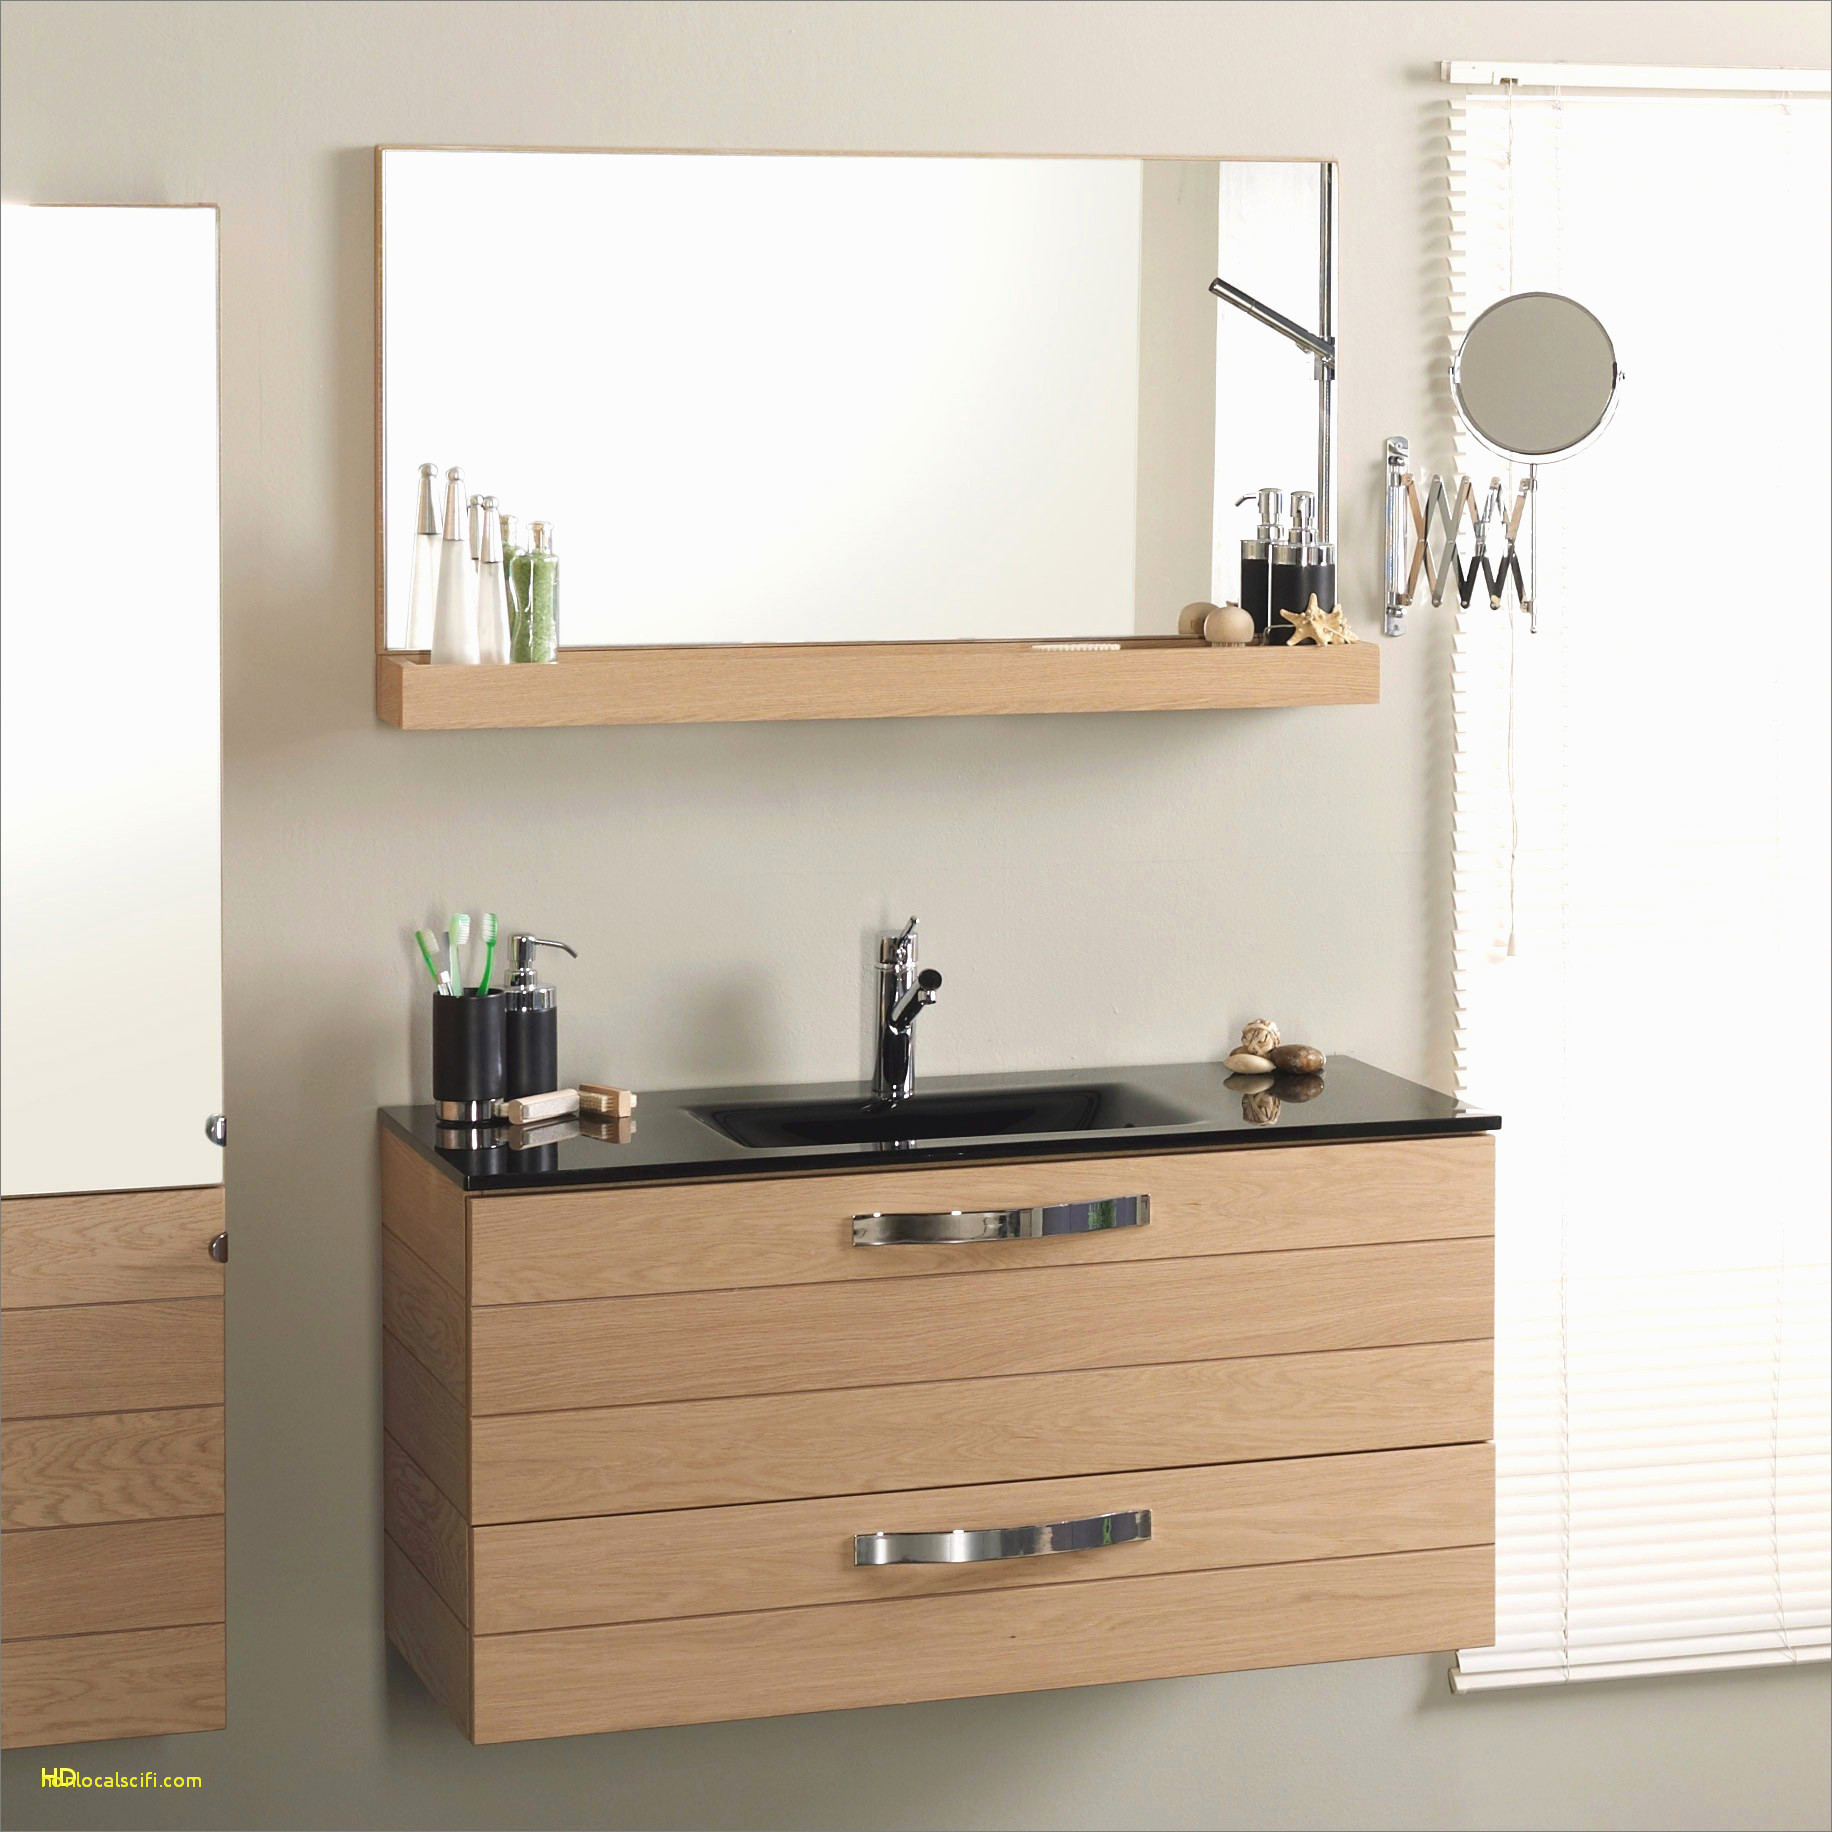 fabricant meuble bois massif fabricant meuble bois massif fabricant de meuble en bois clever pics of fabricant meuble bois massif